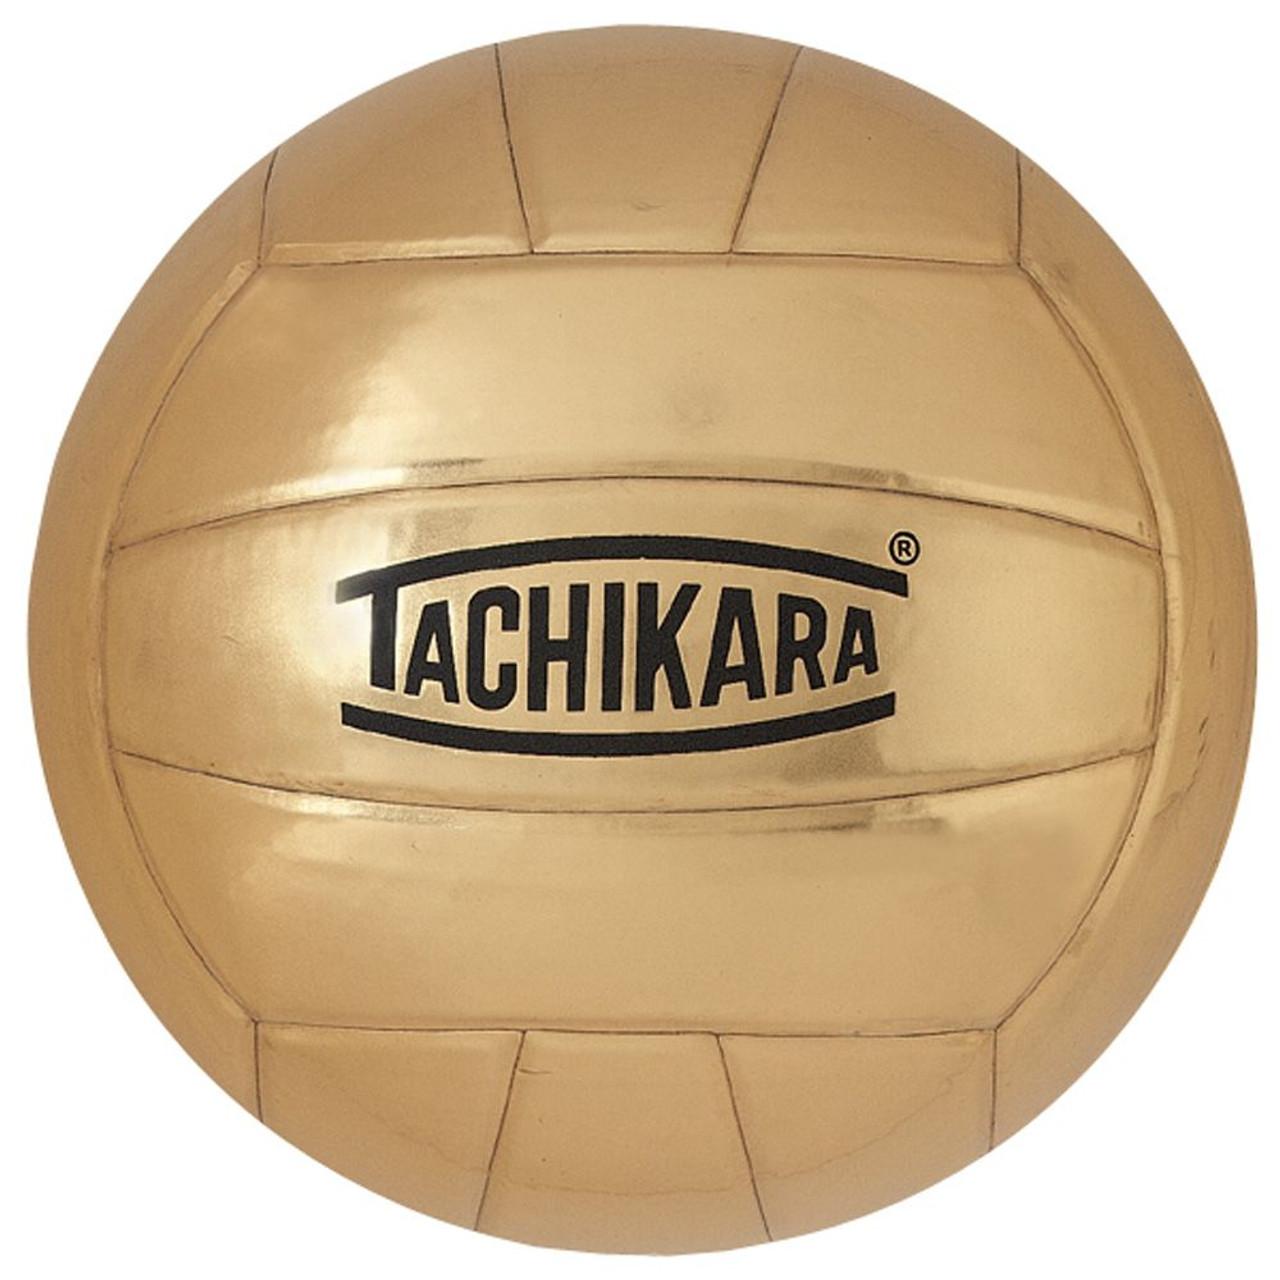 Tachikara Champ Volleyball Real Volleyball